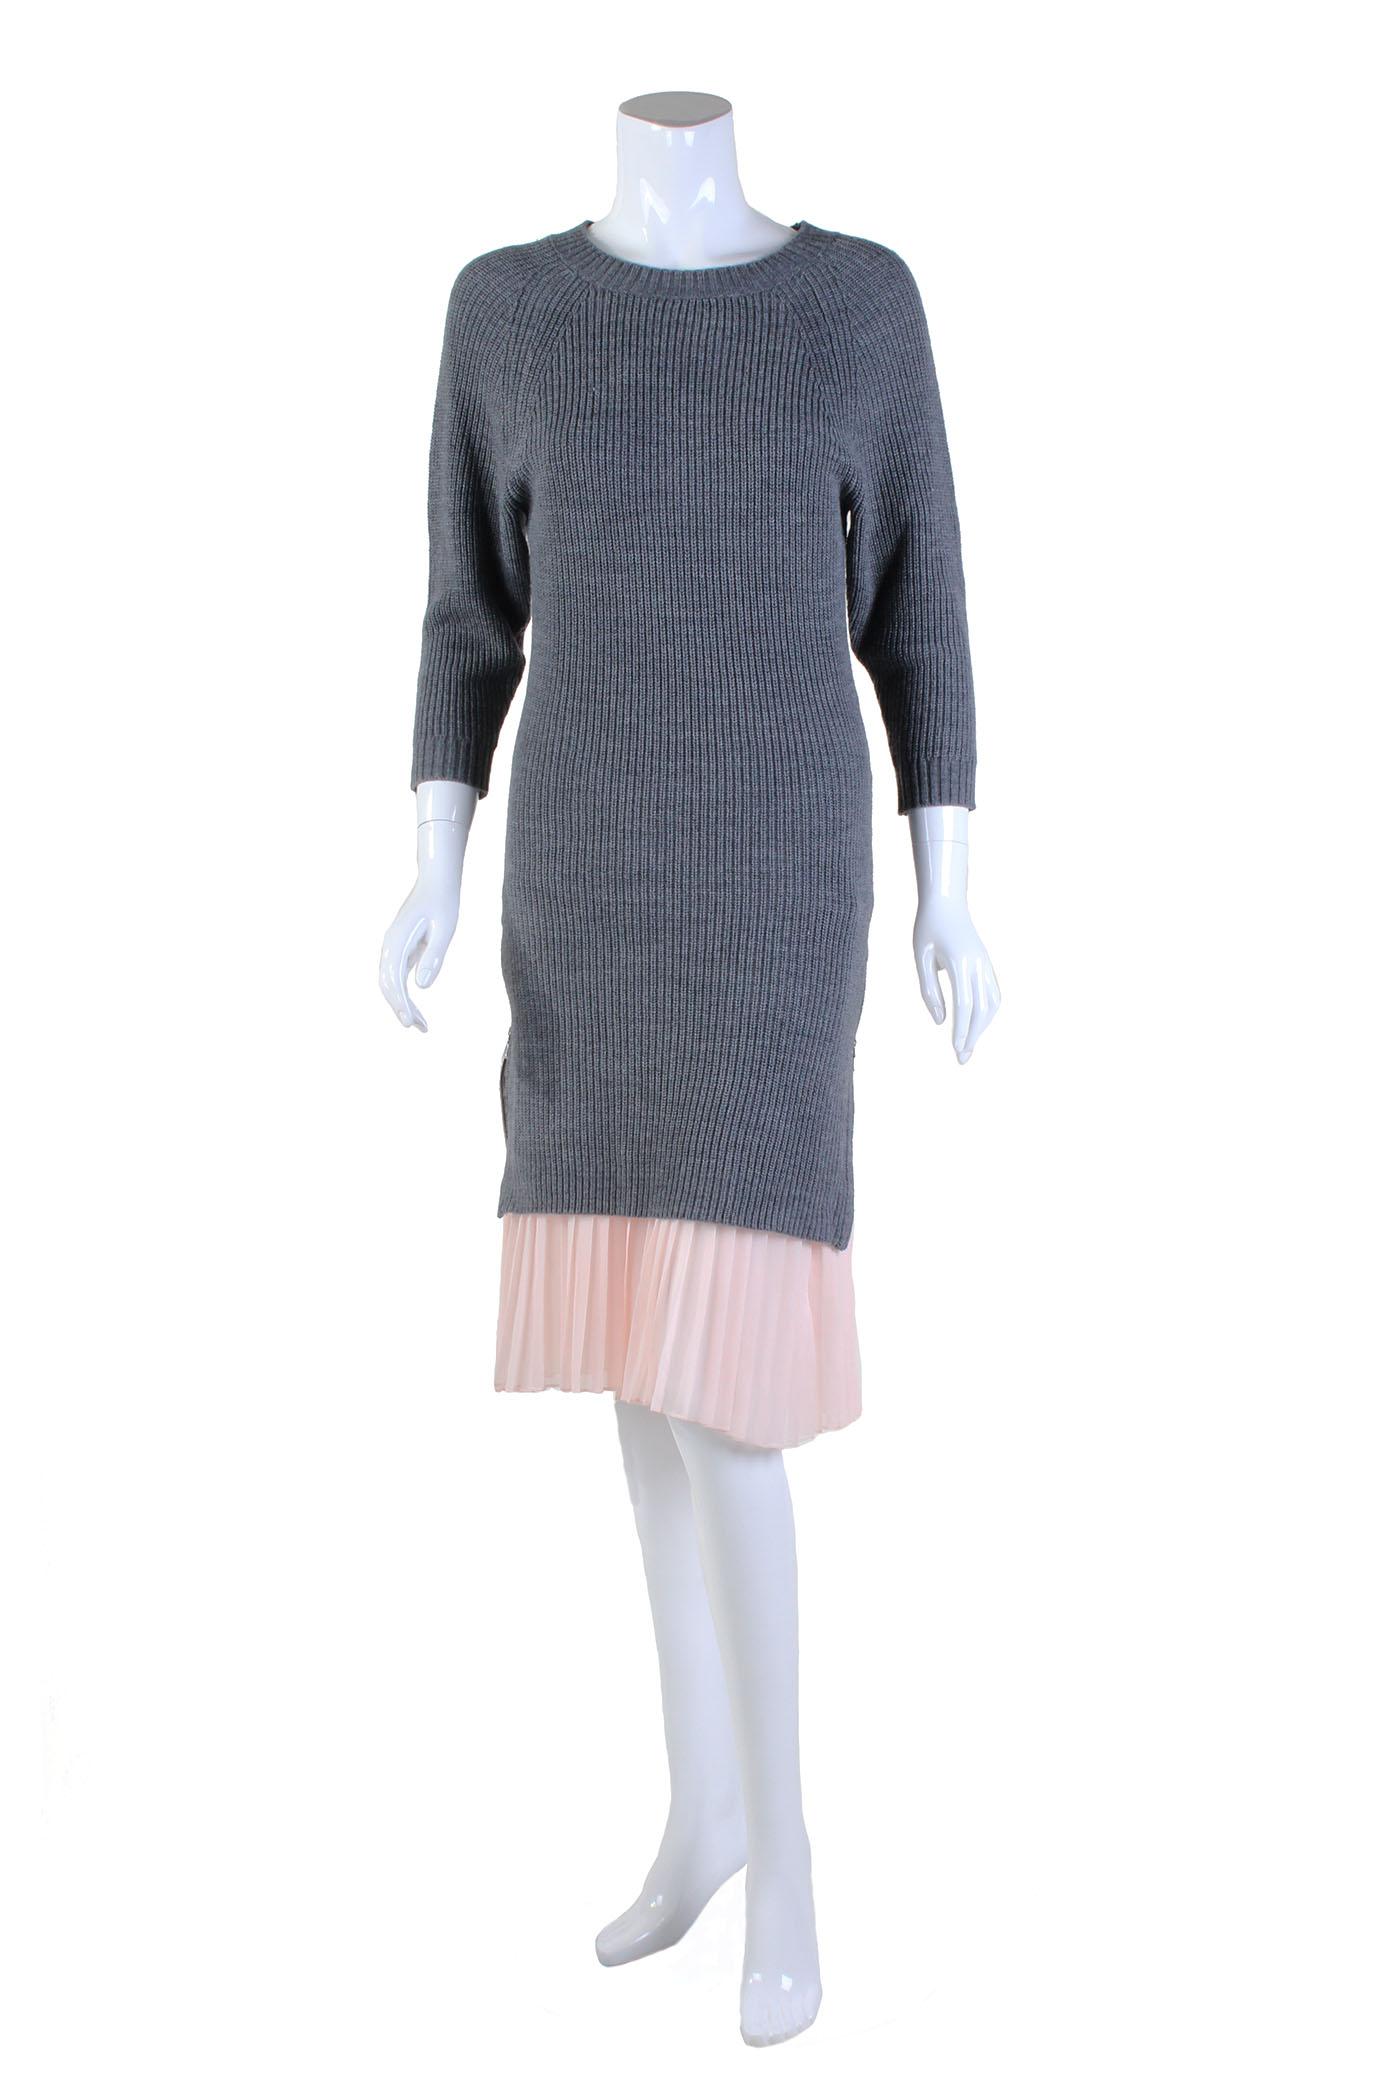 Cosette Cecilia Sweater Dress Light Grey Garmentory